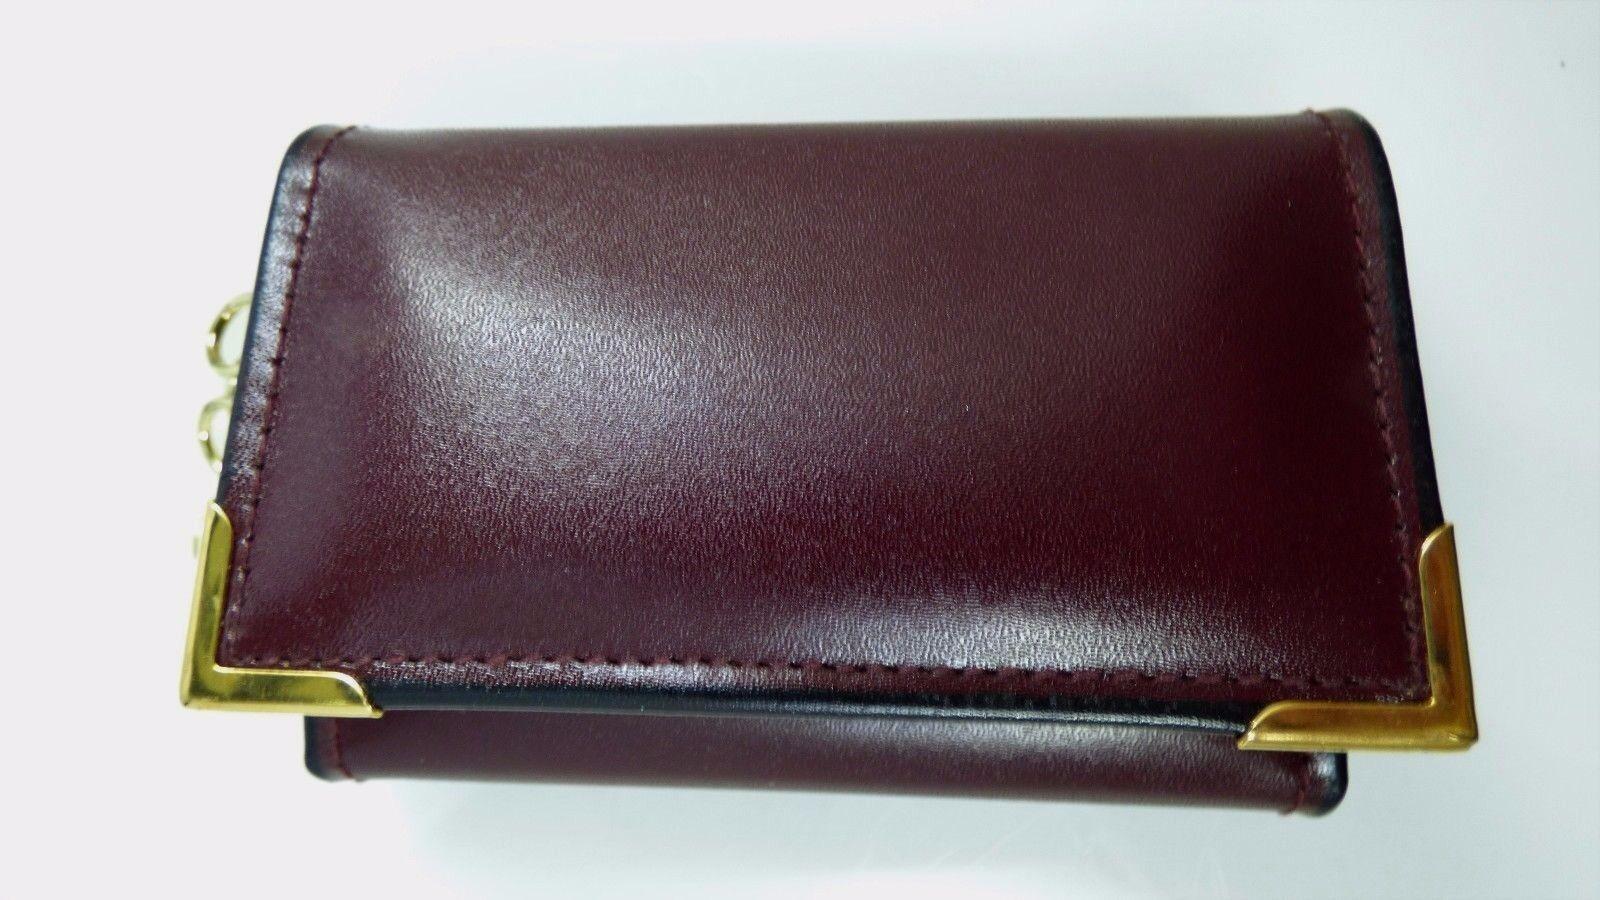 Vintage Di Lido 6 Key Holder Key Case Glove Cowhide Leather In Original Box